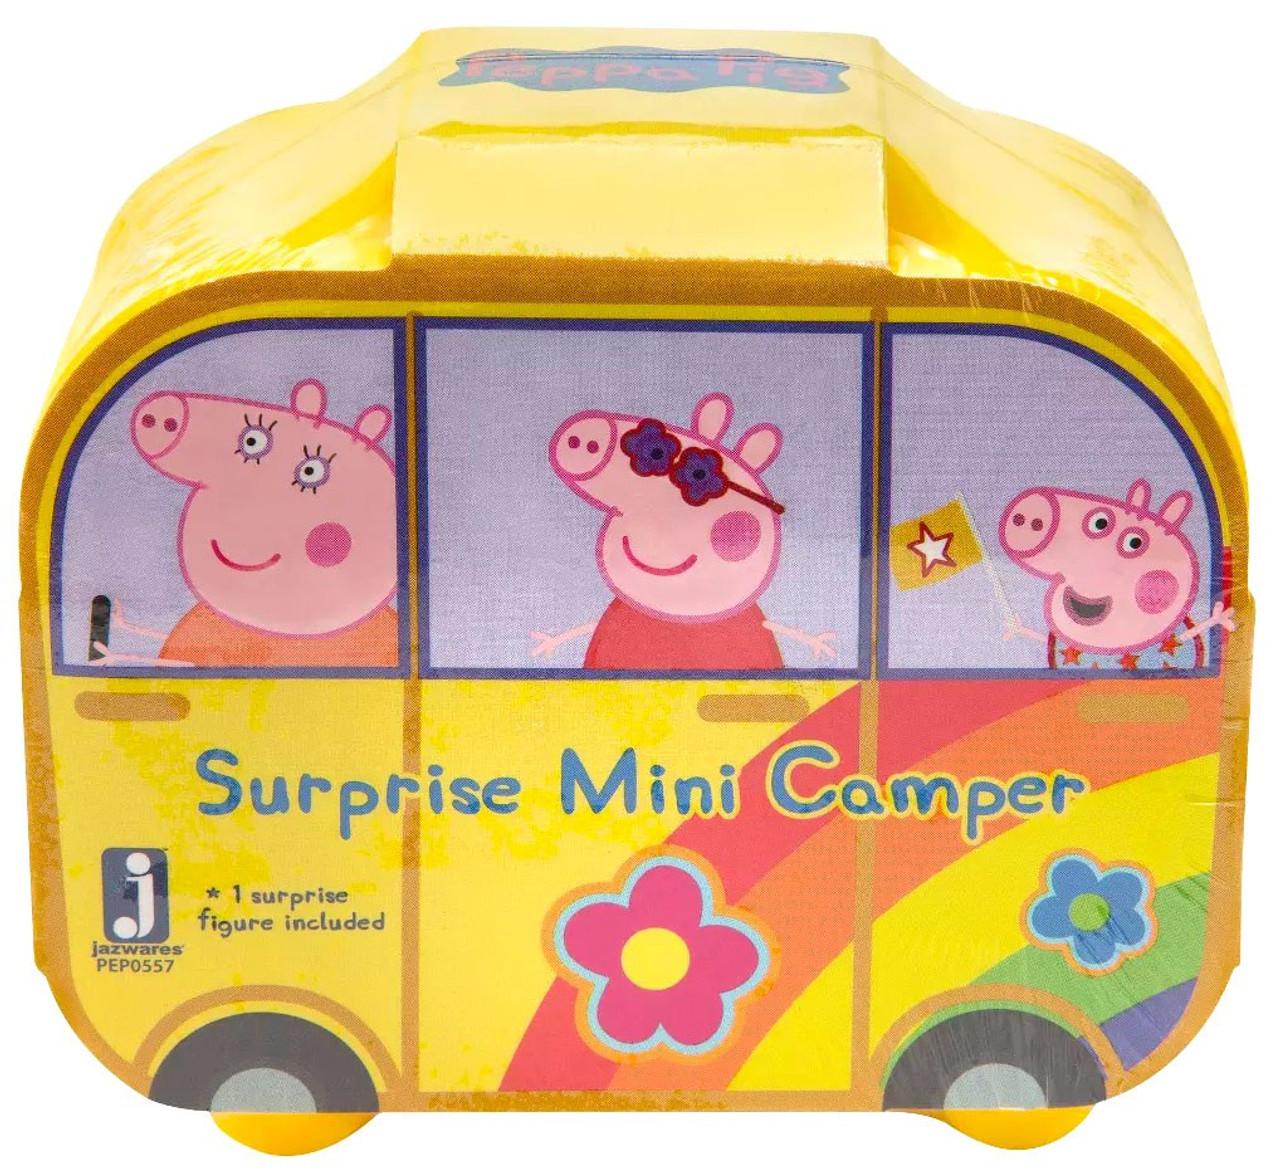 Wondrous Peppa Pig Spielzeug Mini Campervan Lionellim Com Gamerscity Chair Design For Home Gamerscityorg